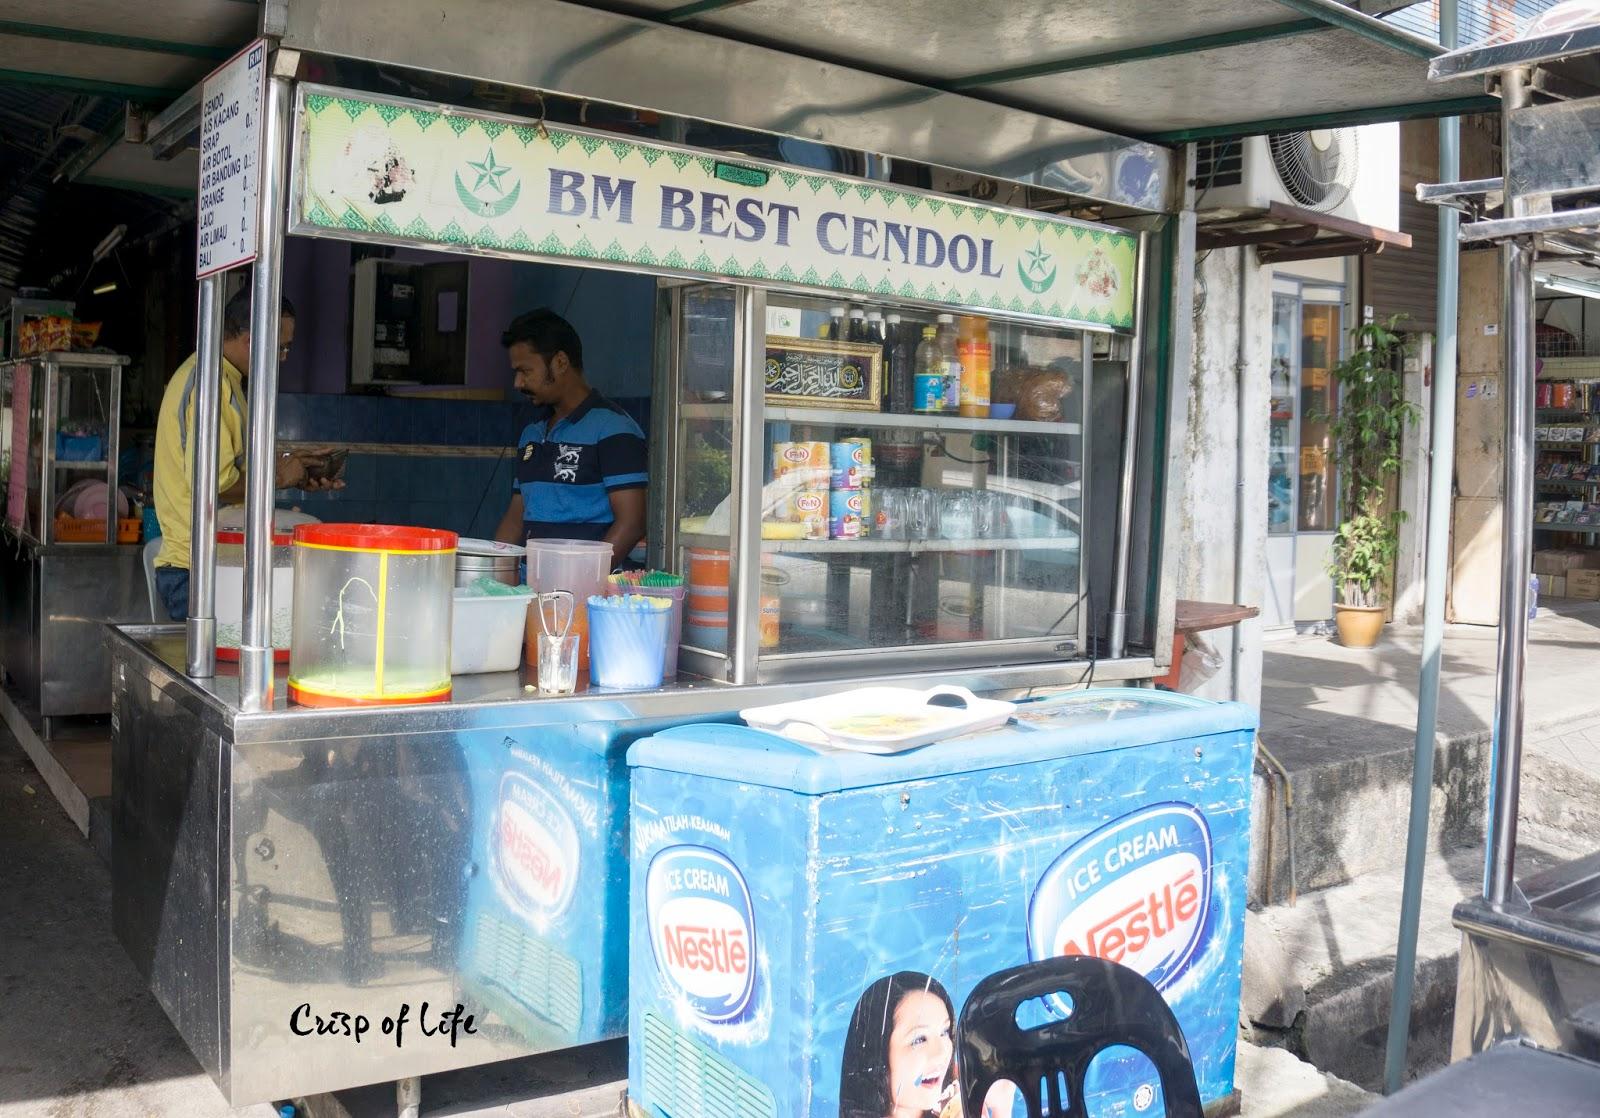 BM Best Cendol Bukit Mertajam Cendol